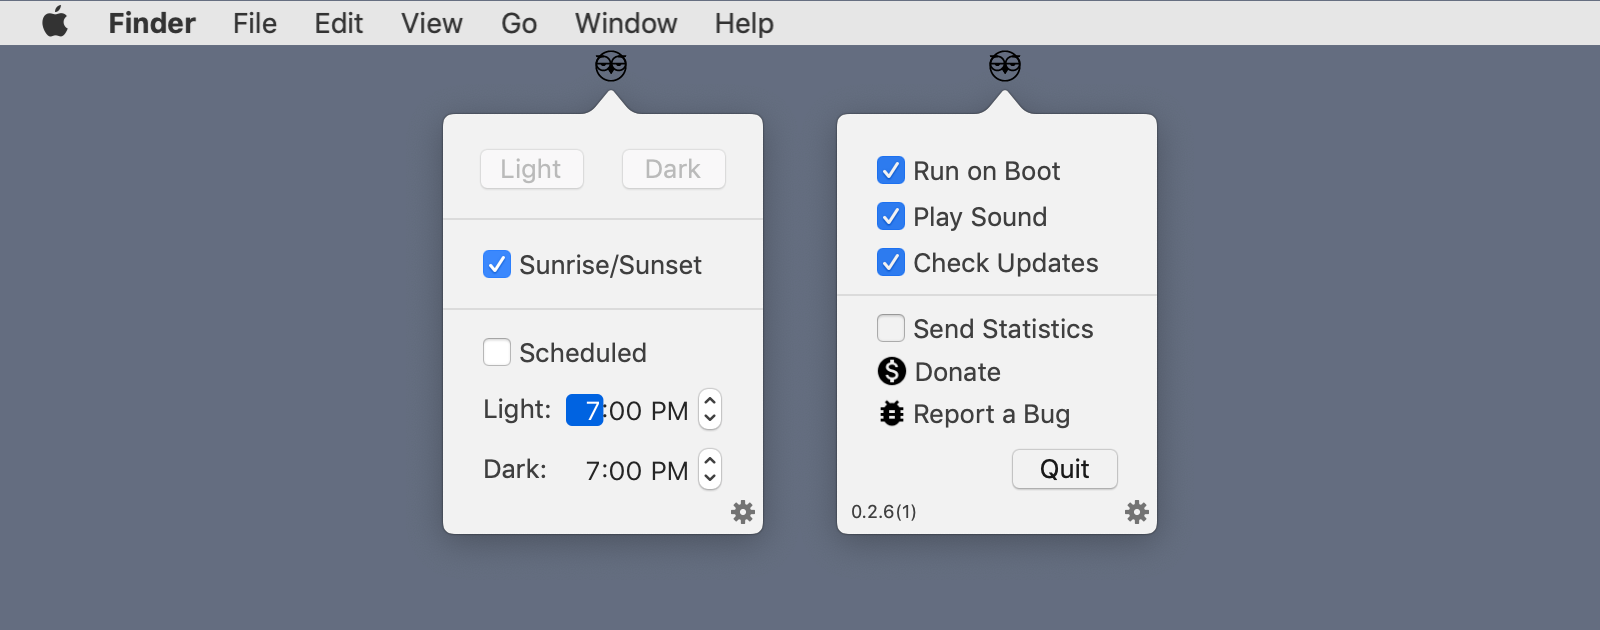 Get Automatic Dark Mode With NightOwl